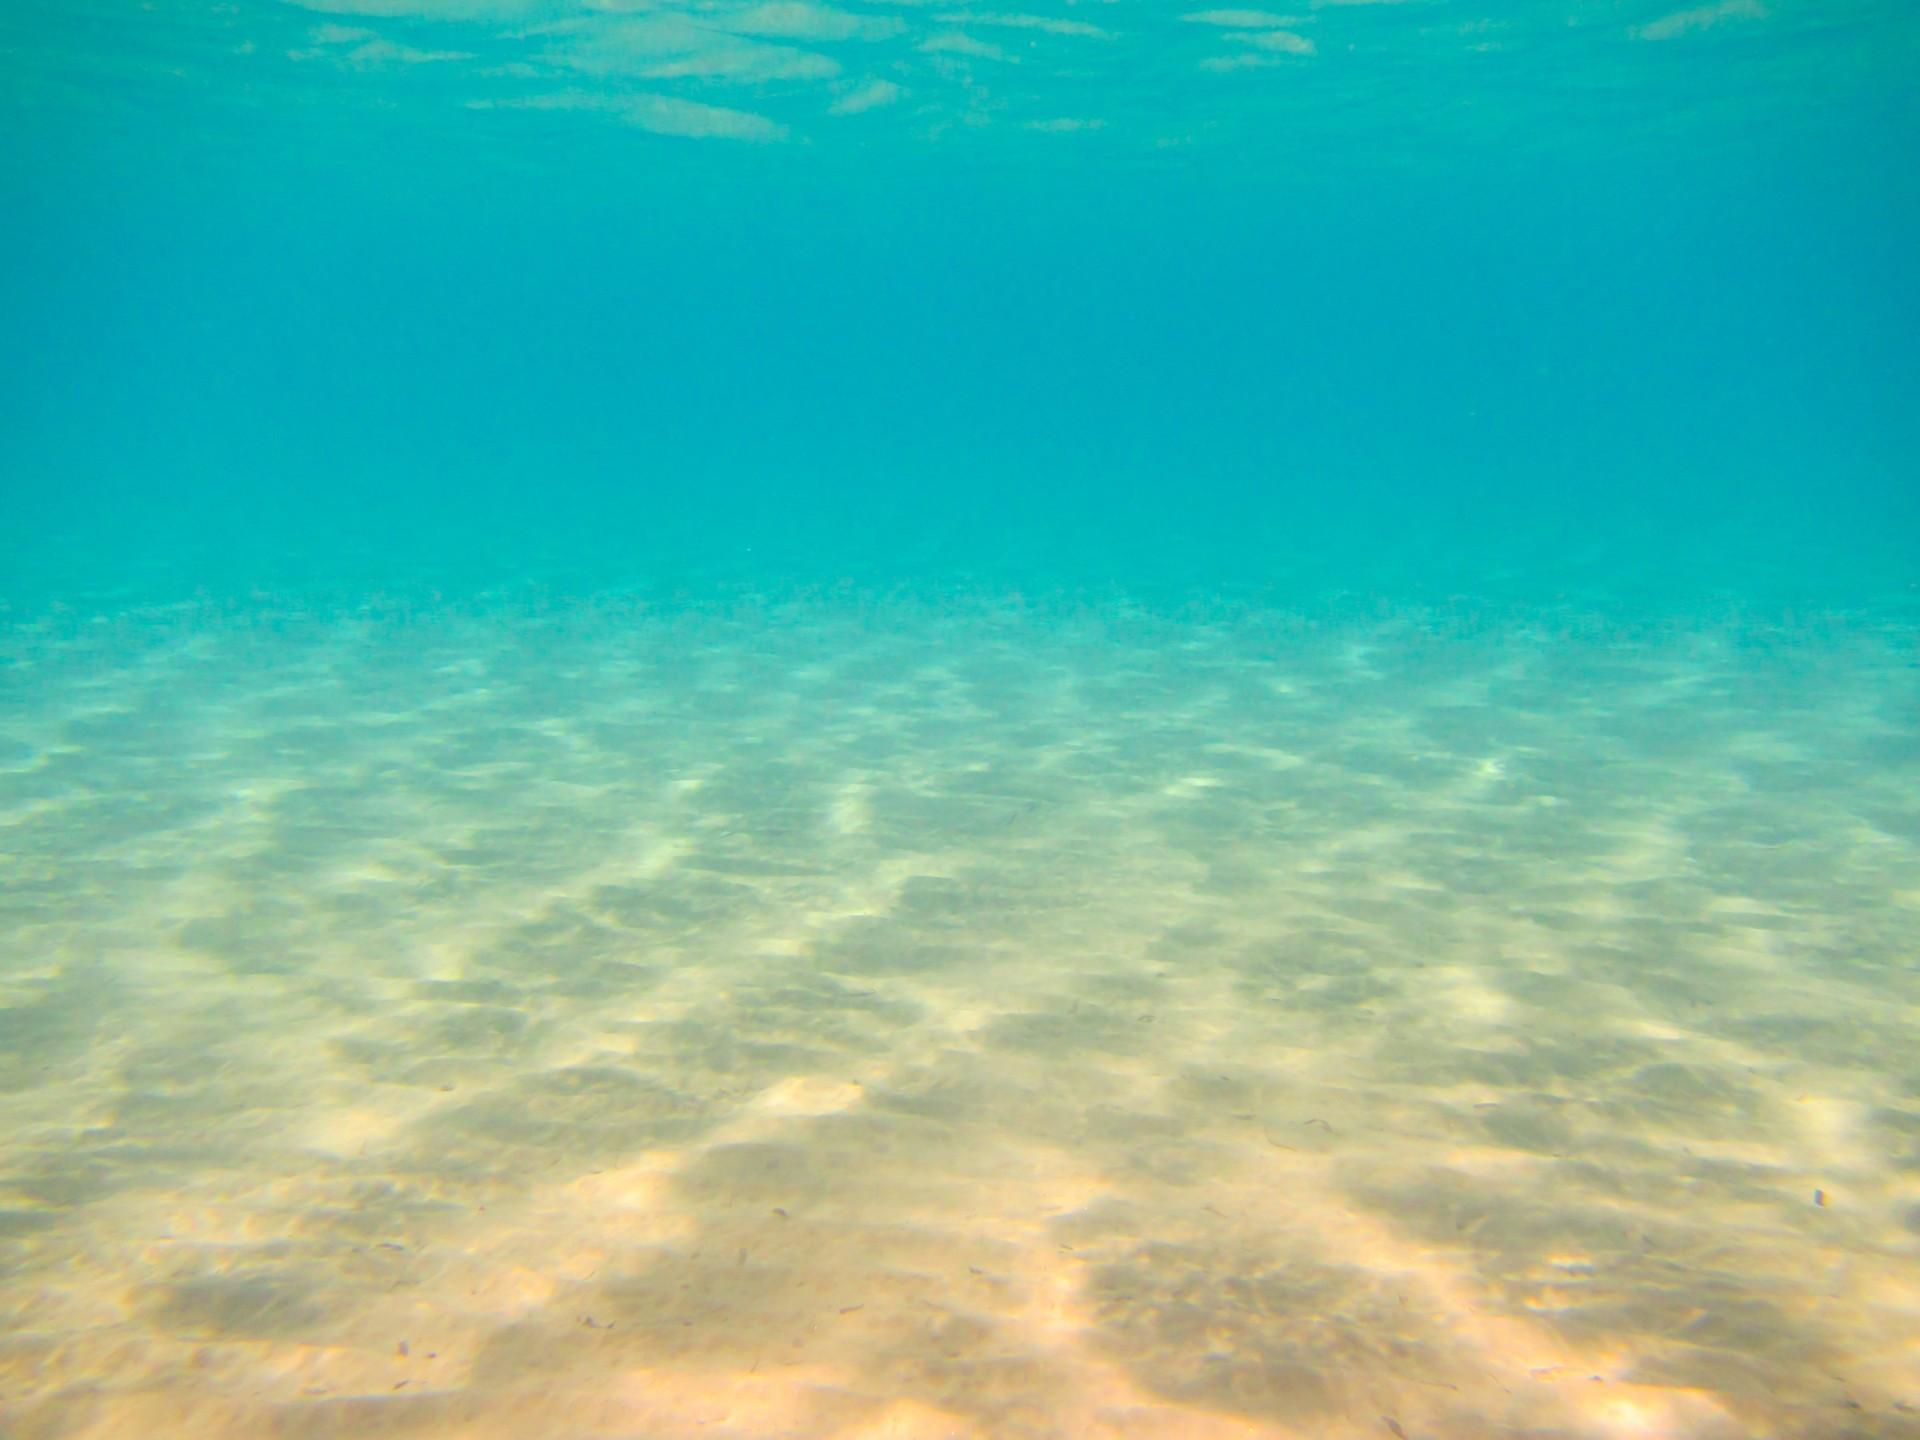 Aquabackdropbackgroundbeneathblue   photo from needpixcom 1920x1440